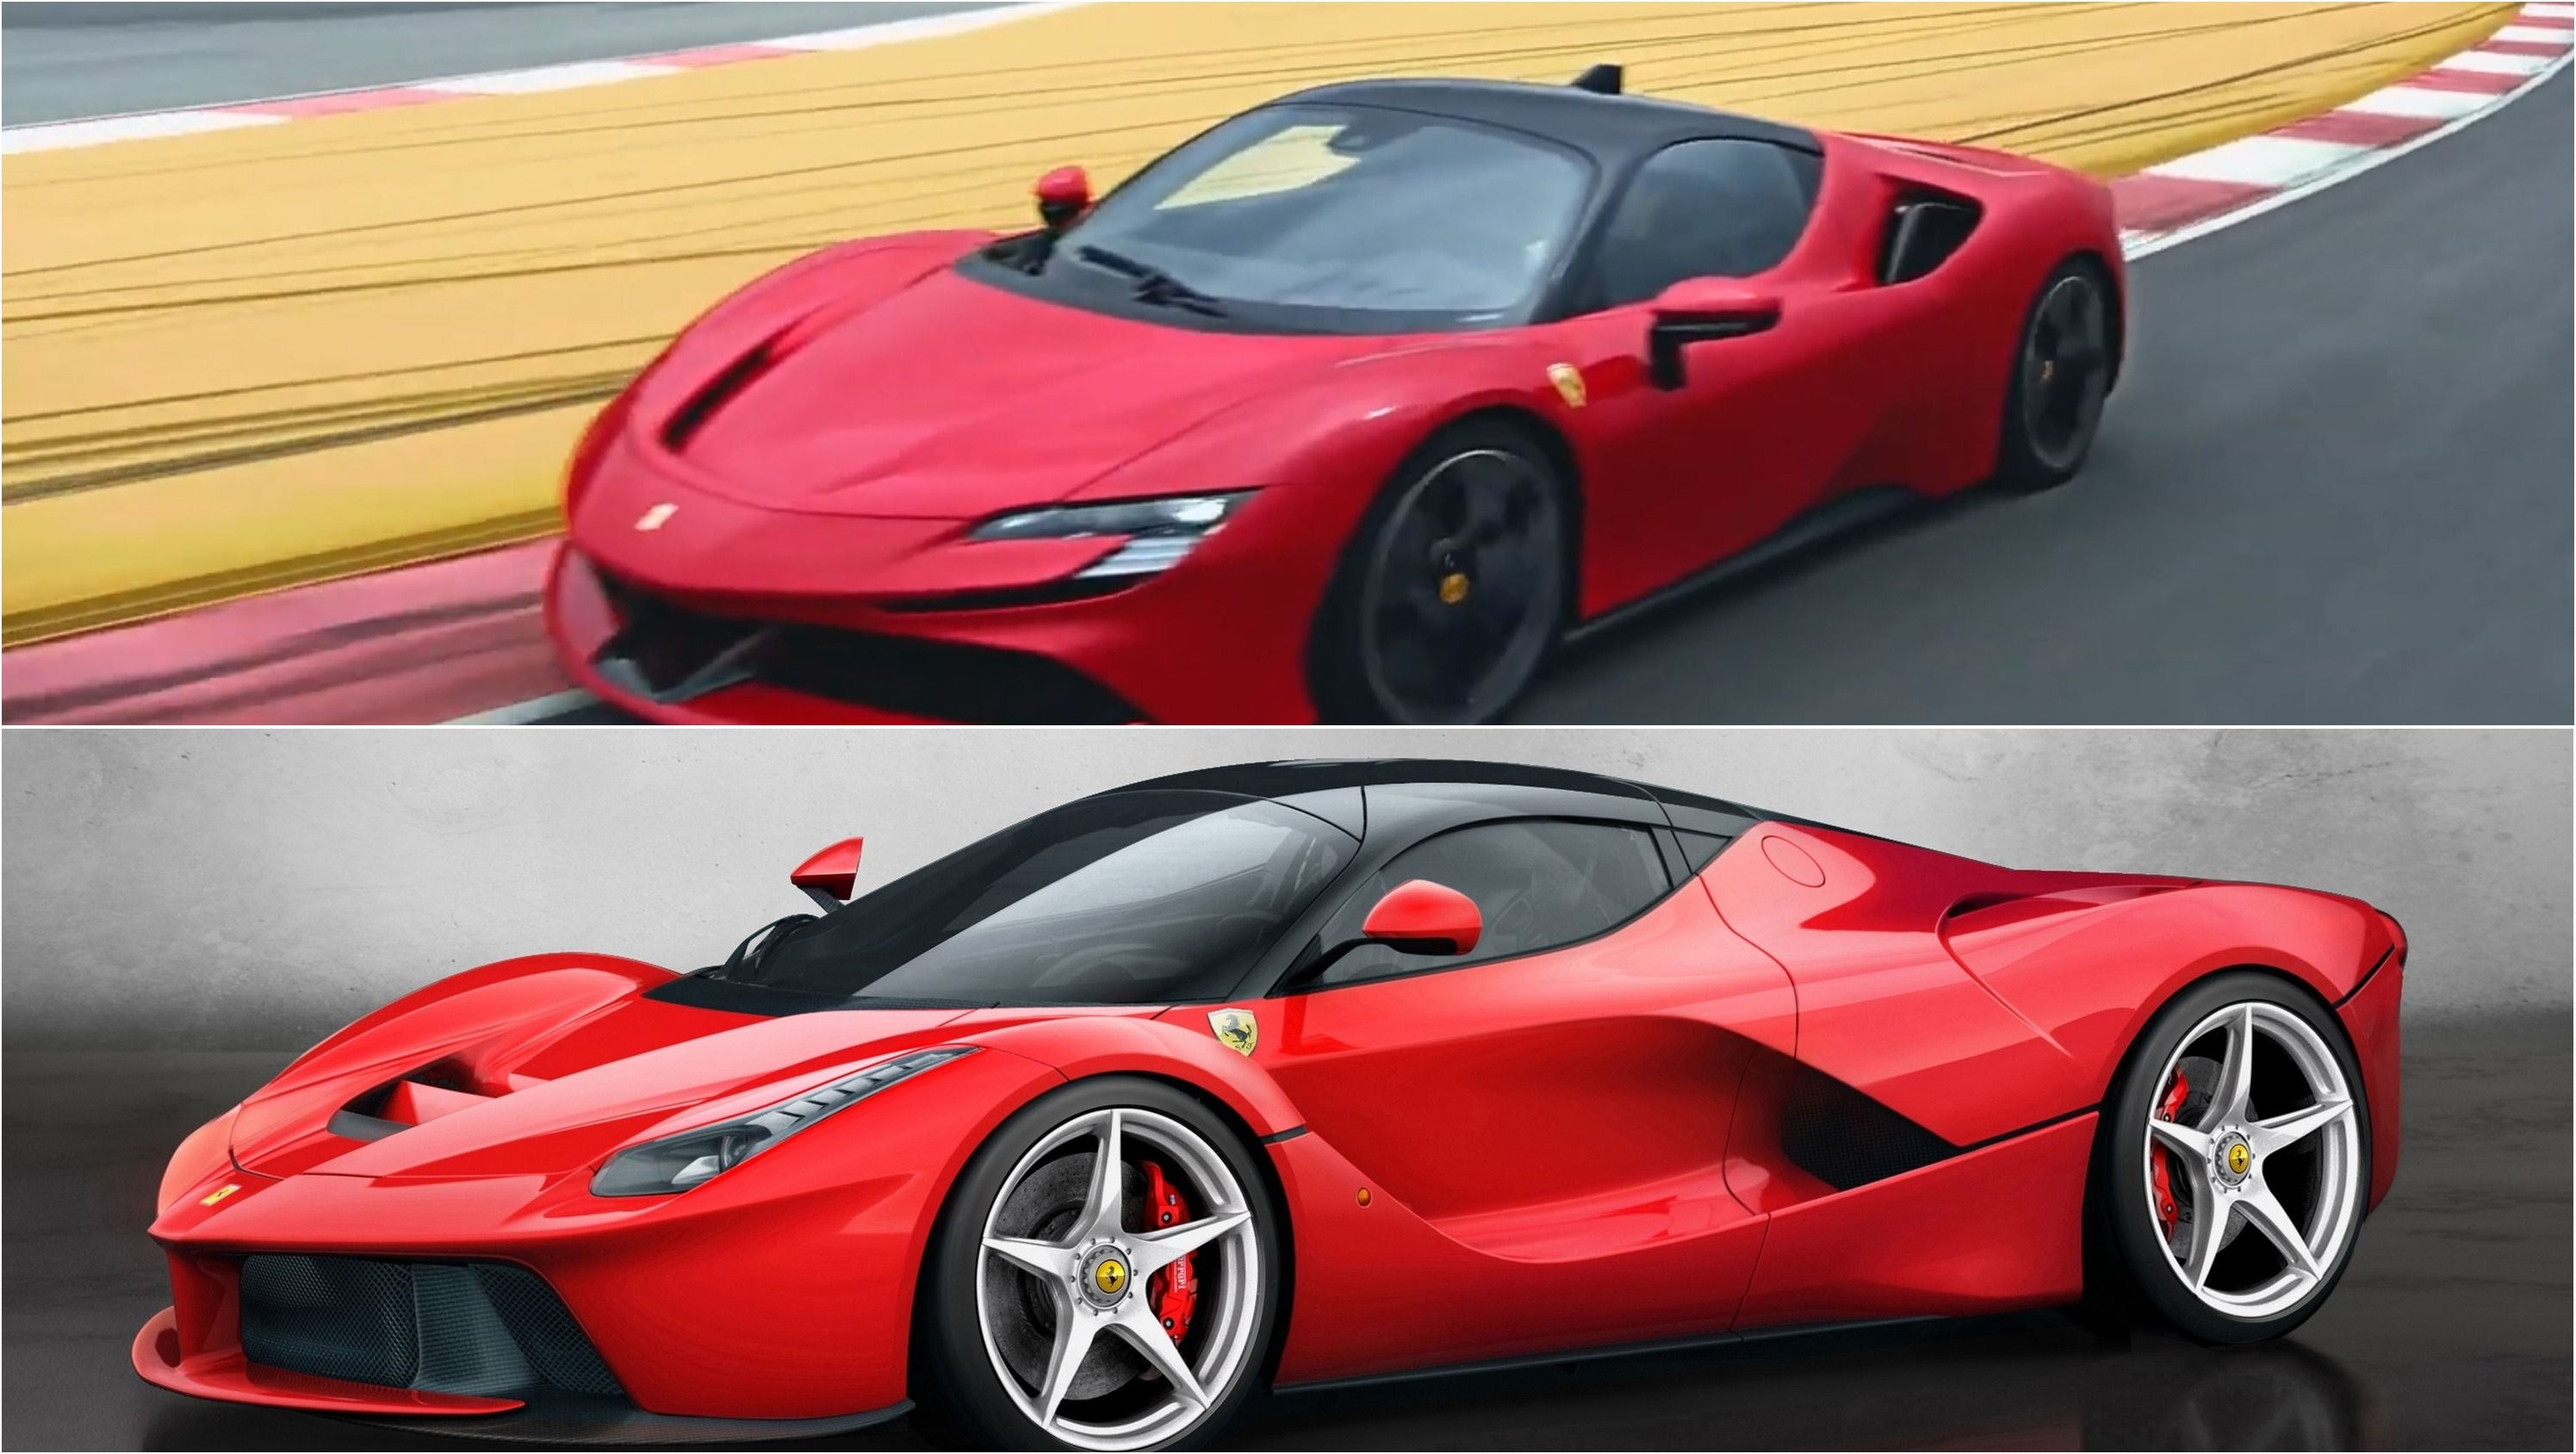 Ferrari Hybrid Showdown Sf90 Stradale Vs Laferrari With Images